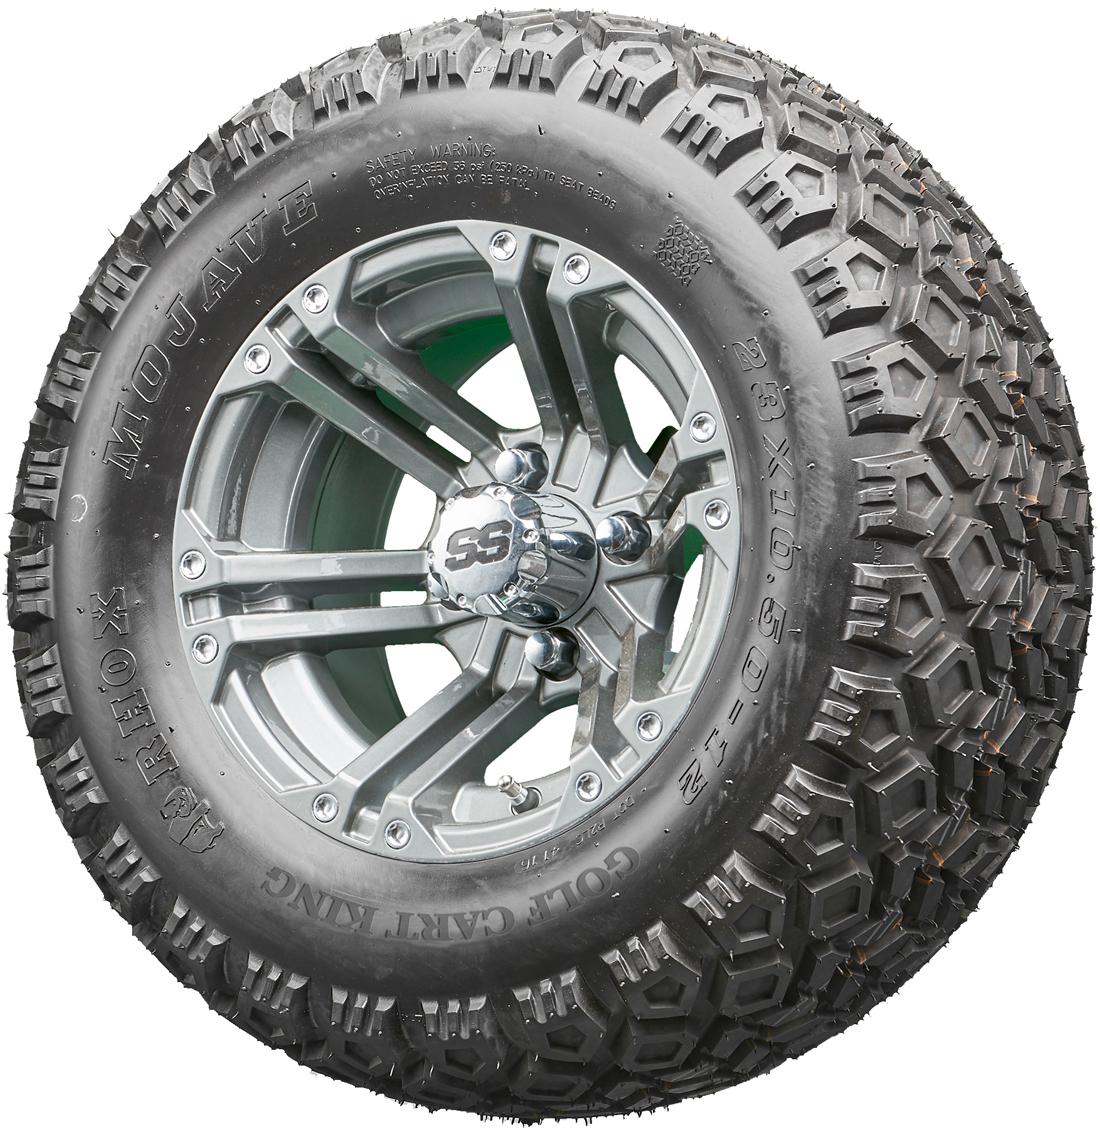 golf cart wheels and tires rhox rx335 gun metal 12 lifted tires combo [ 1100 x 1132 Pixel ]